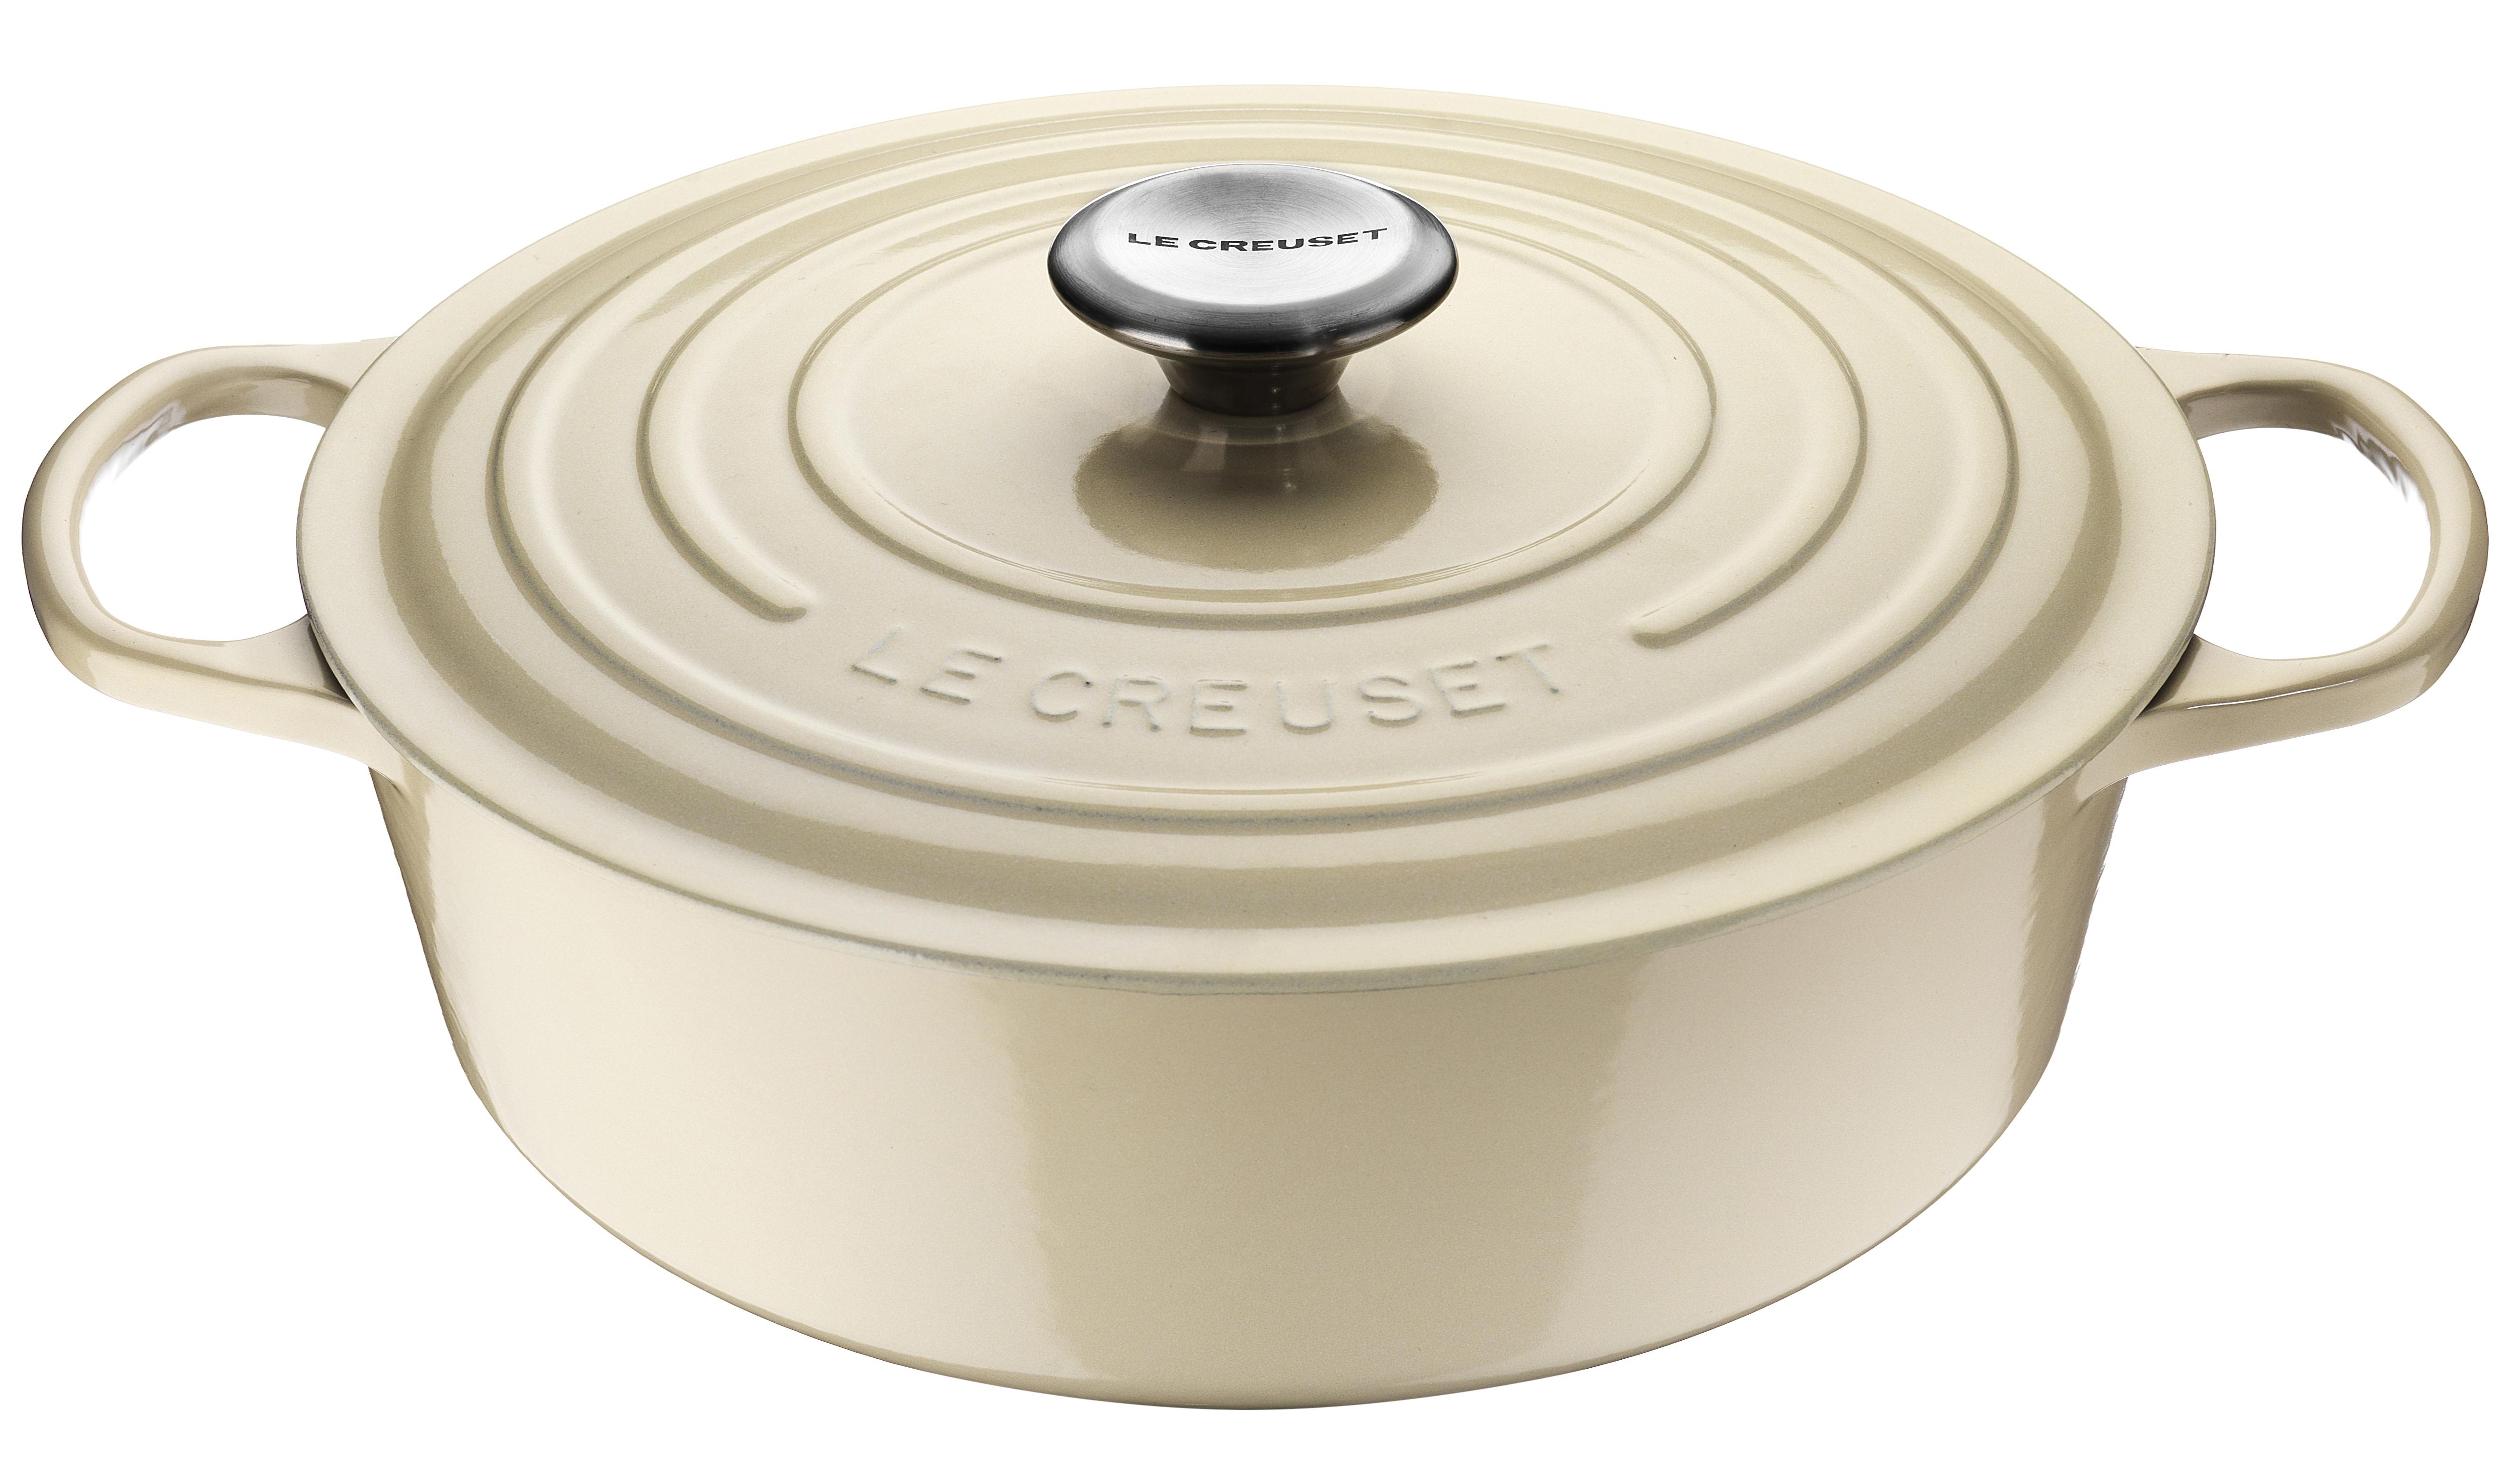 Le Creuset Signature Oval Gryta 27 cm 4,1 L Creme